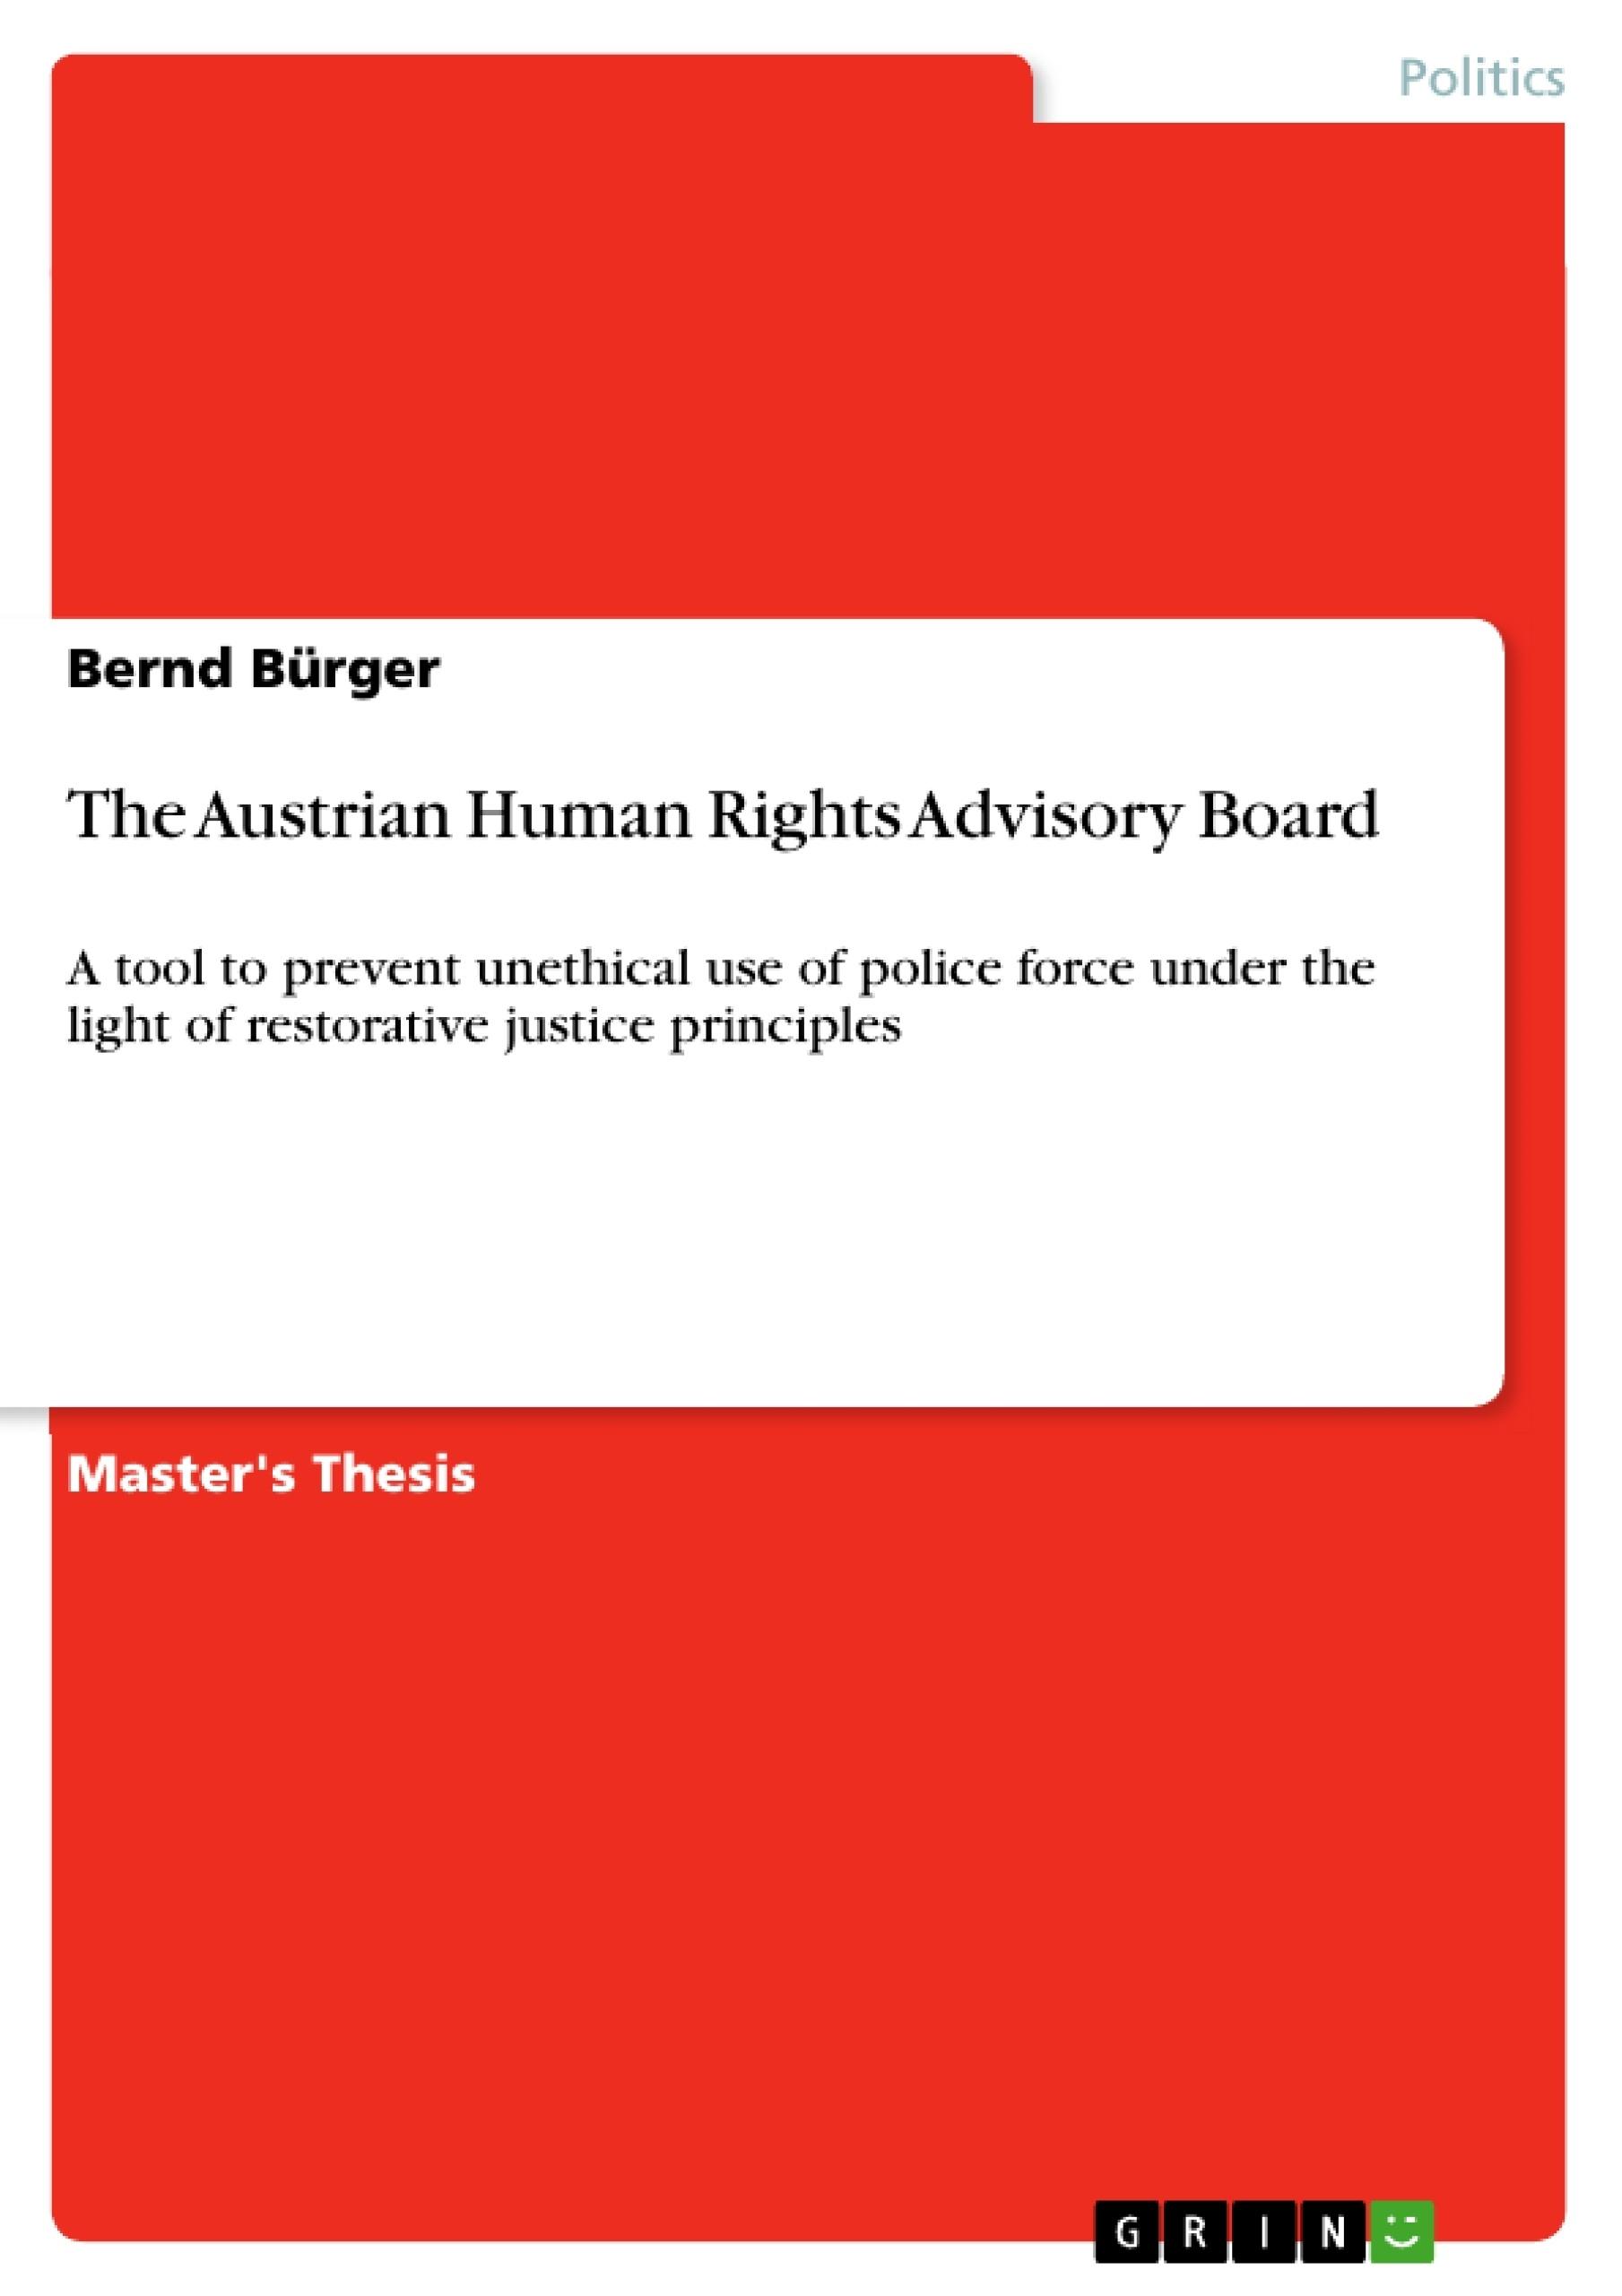 Title: The Austrian Human Rights Advisory Board